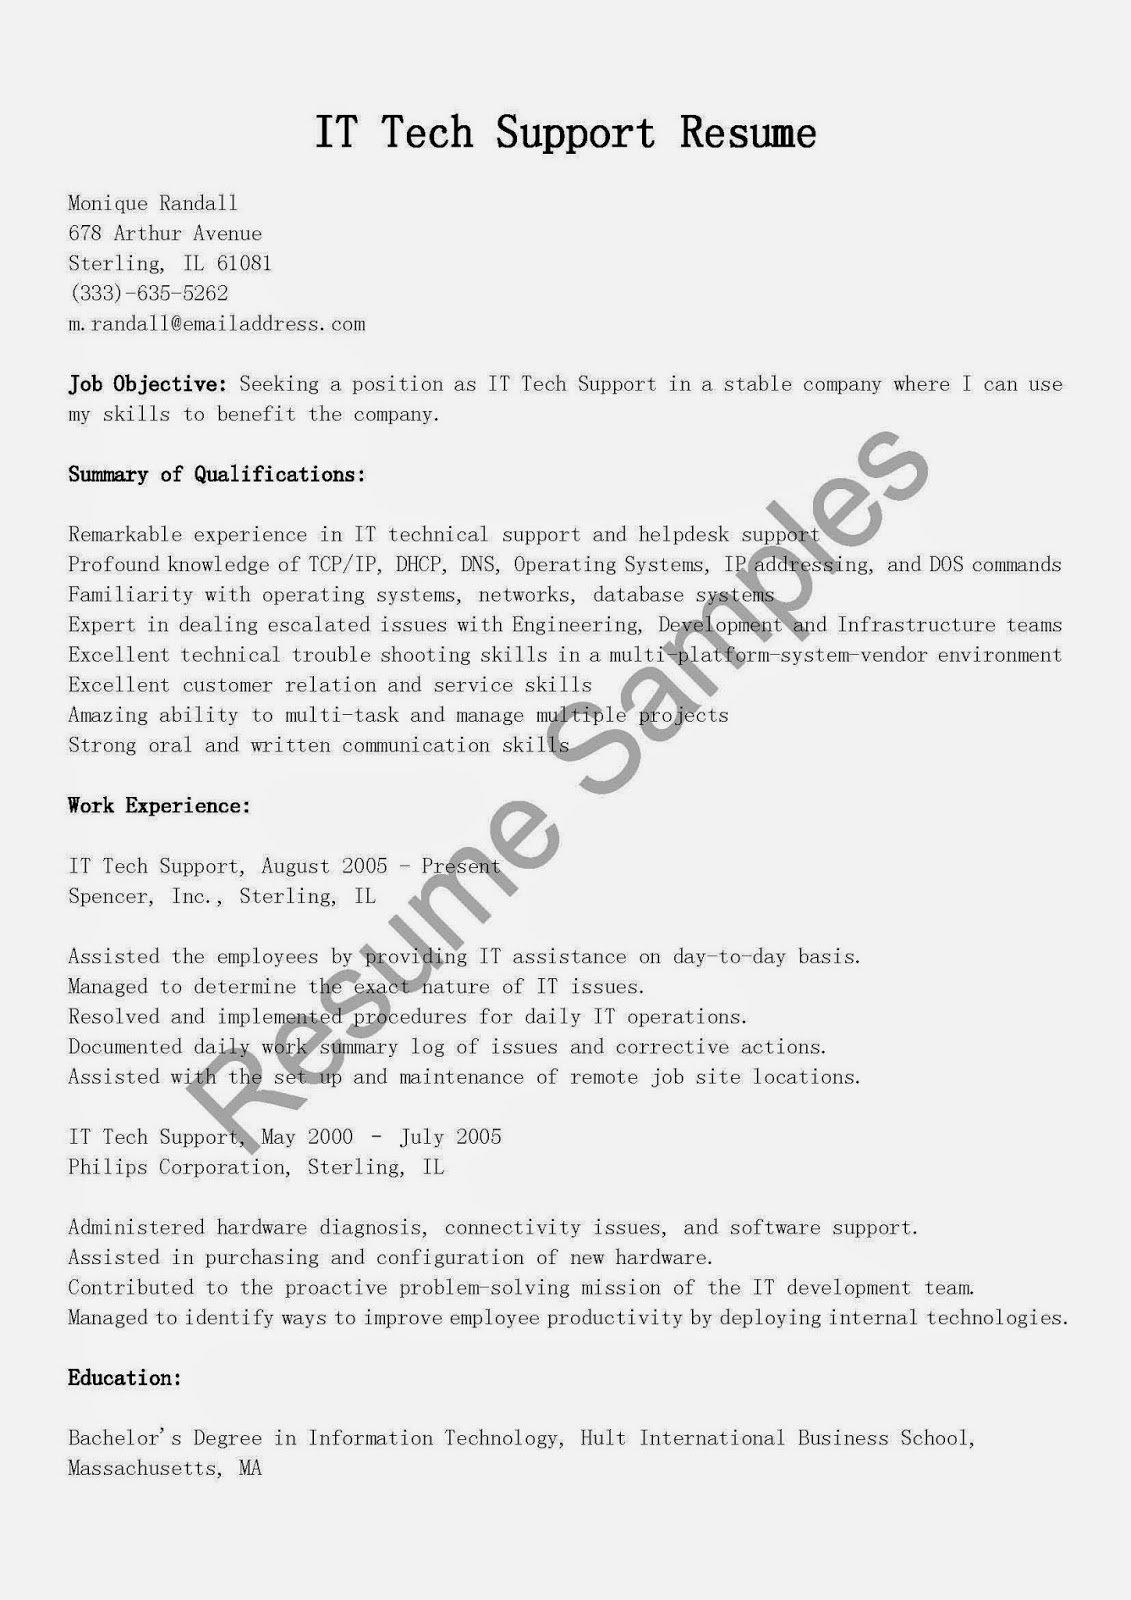 Resume Samples It Tech Support Resume Sample